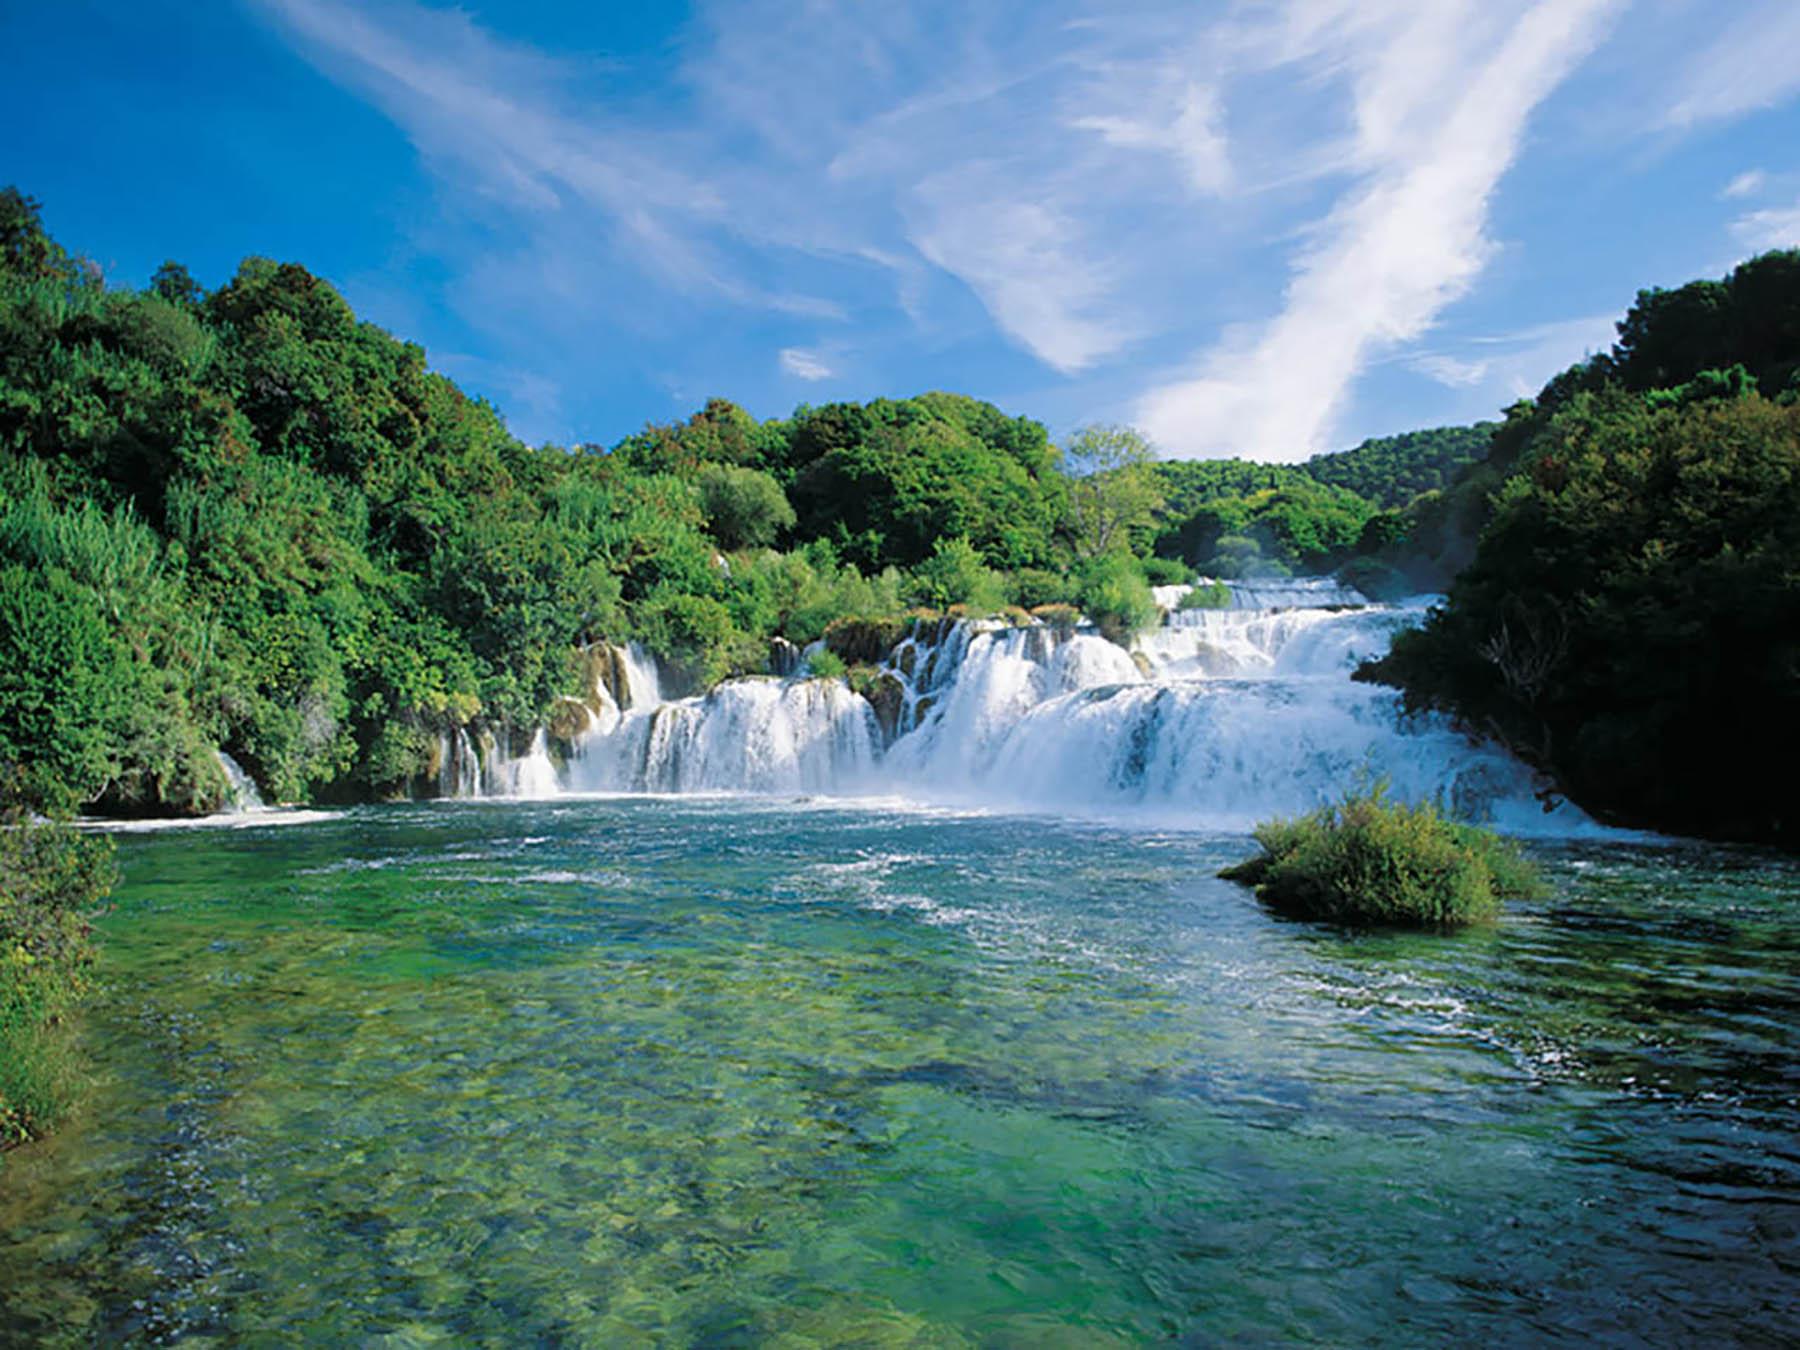 Iguacu National Park, Foz do Iguacu: Address, Phone Number, Iguacu National Park Reviews: 5/5